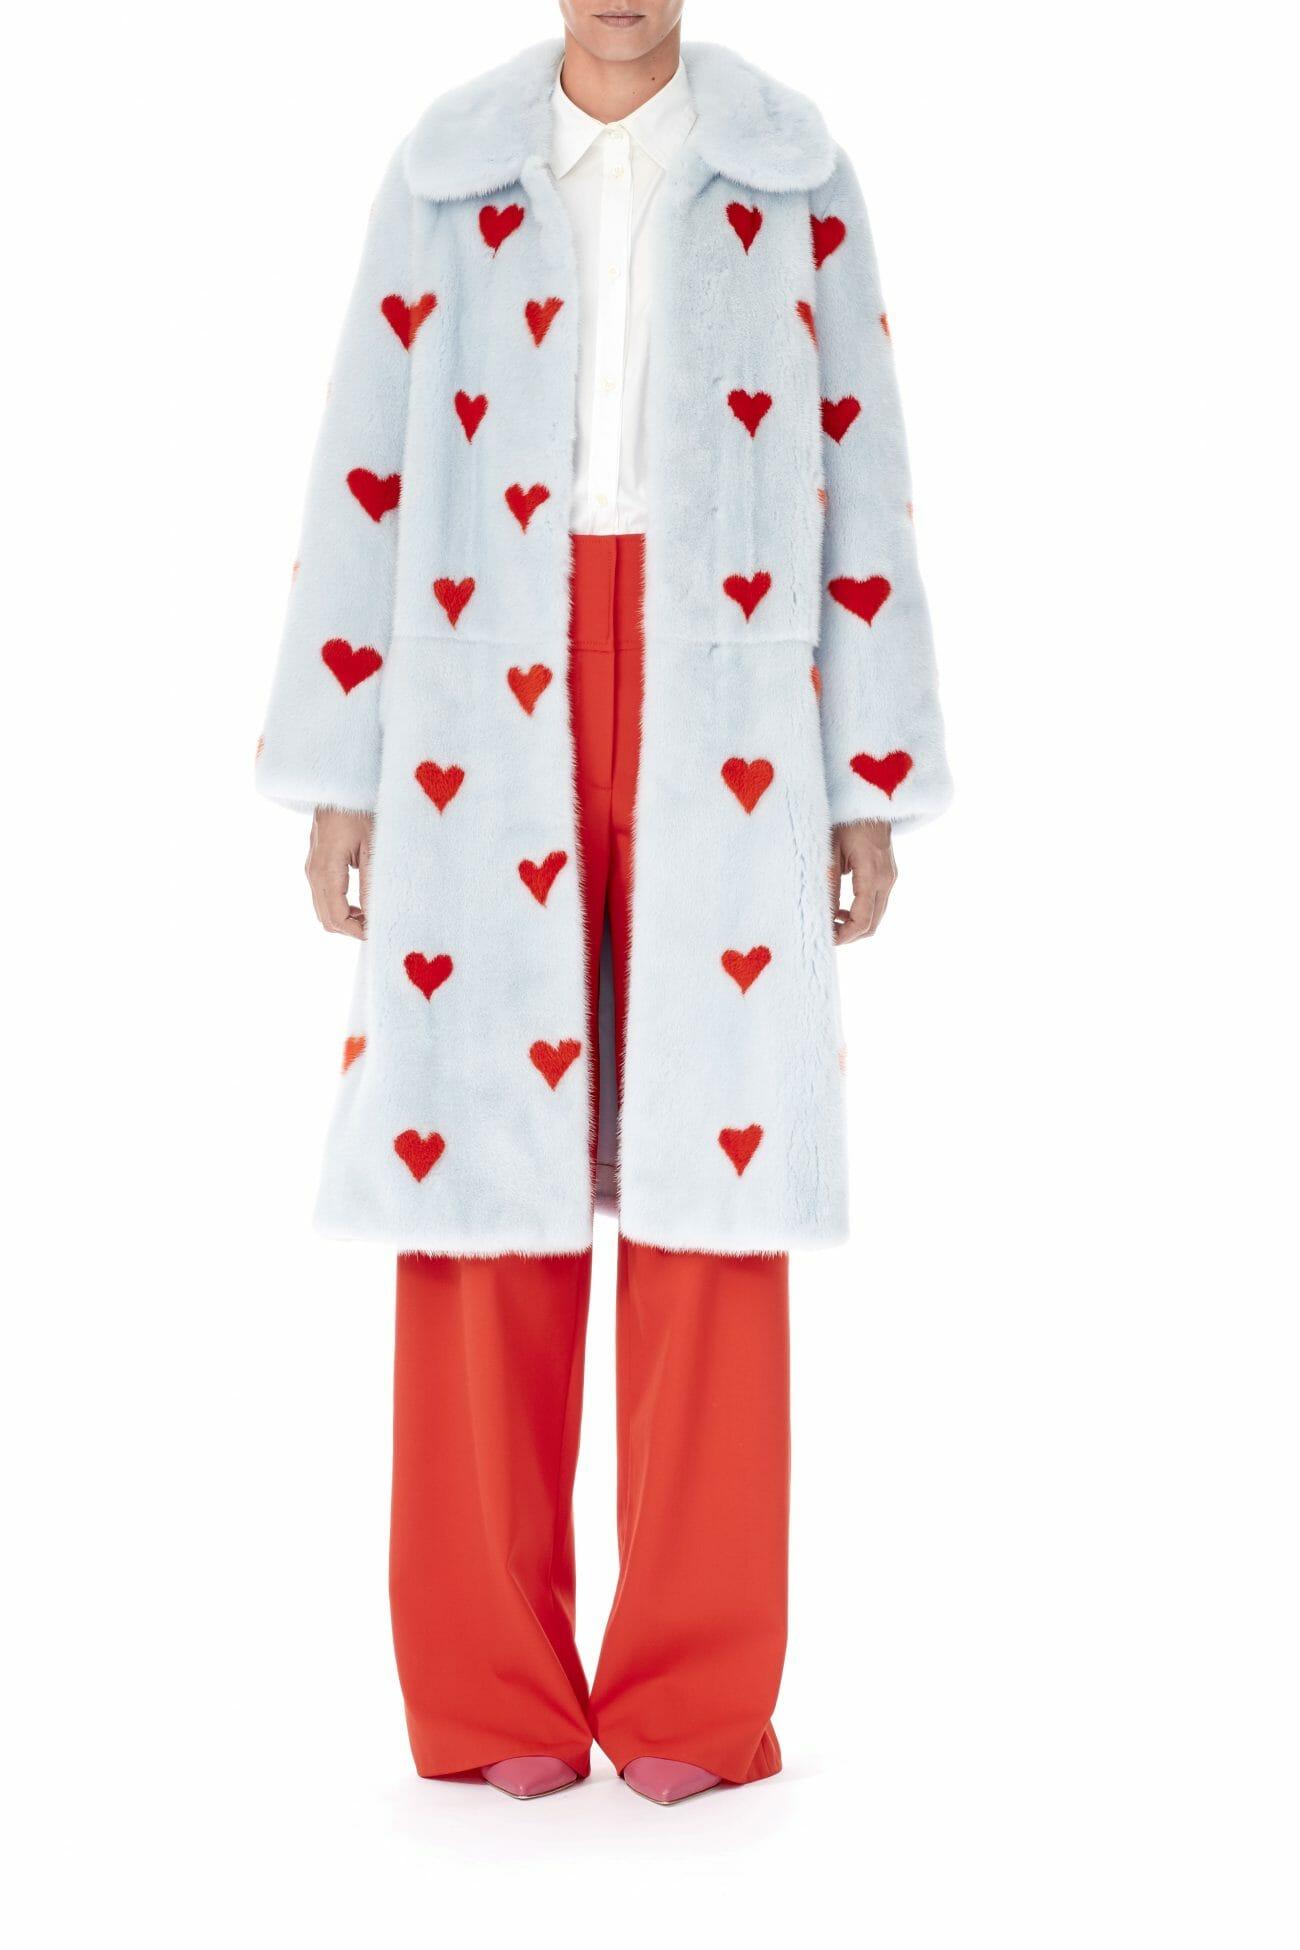 Carolina-Herrera-New-York-Resort-2019-look-156-heart-coat-blue-red-look-miramar